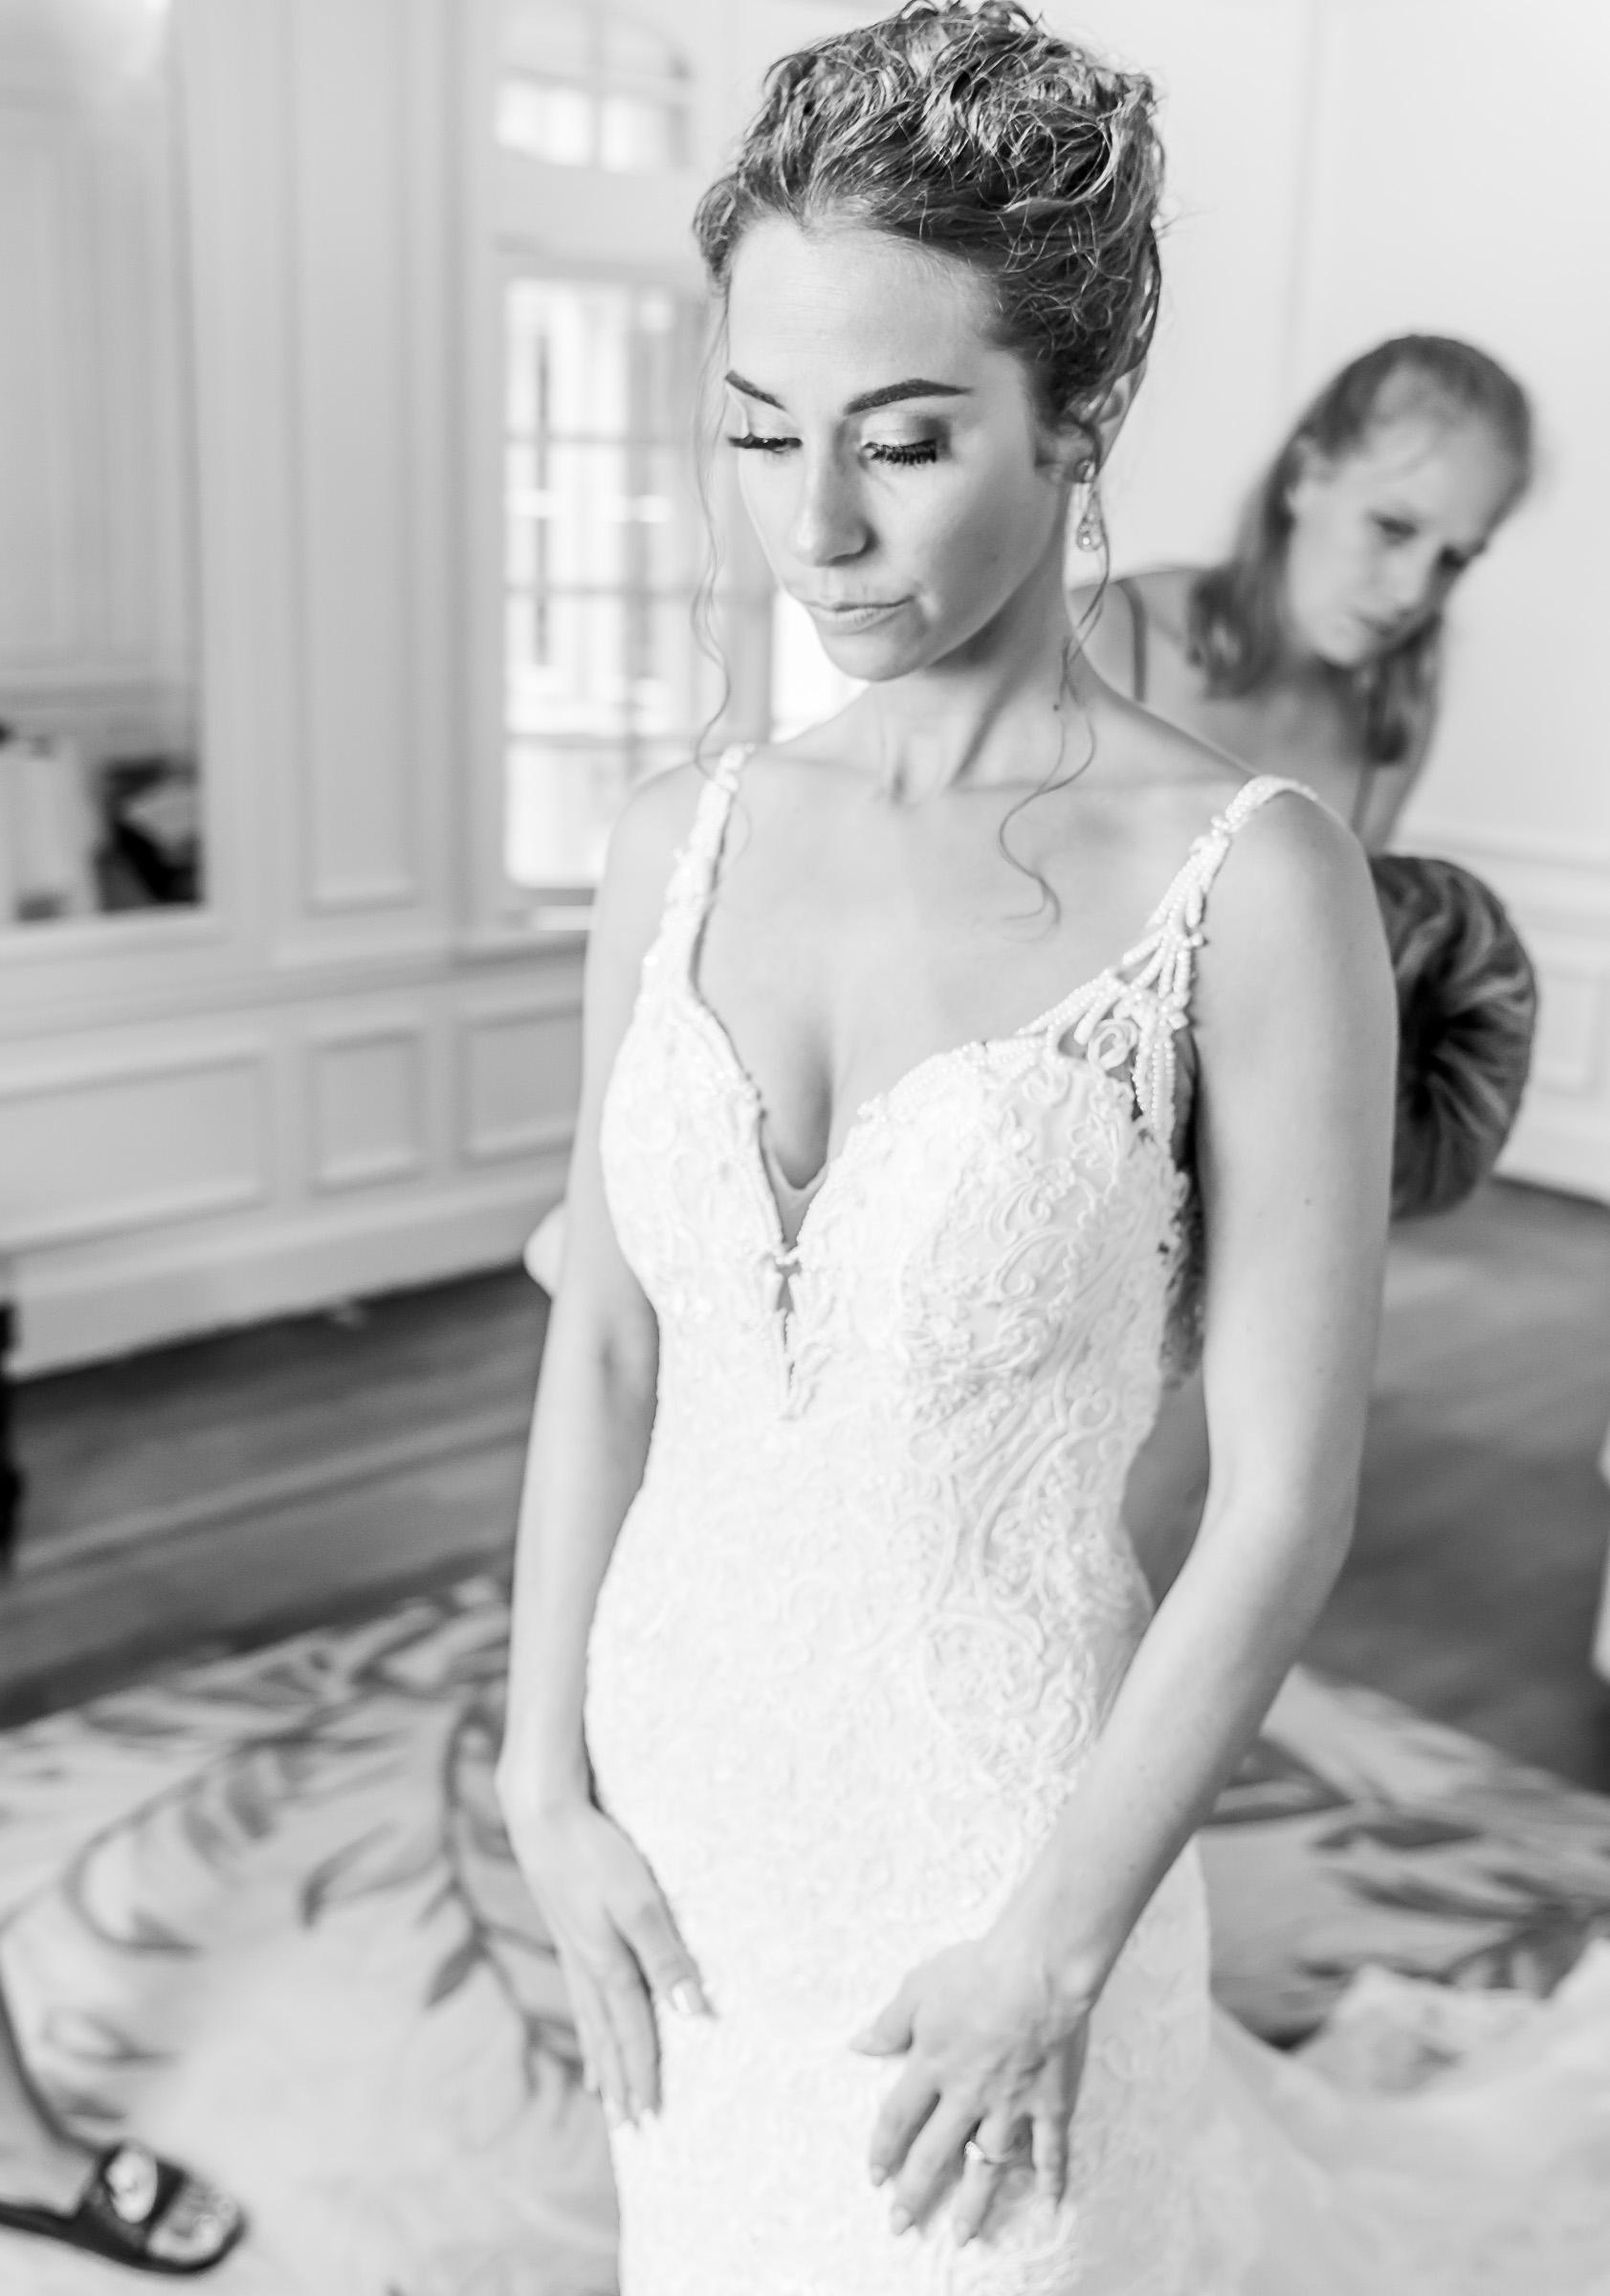 fowler house blog erin wedding-49.jpg